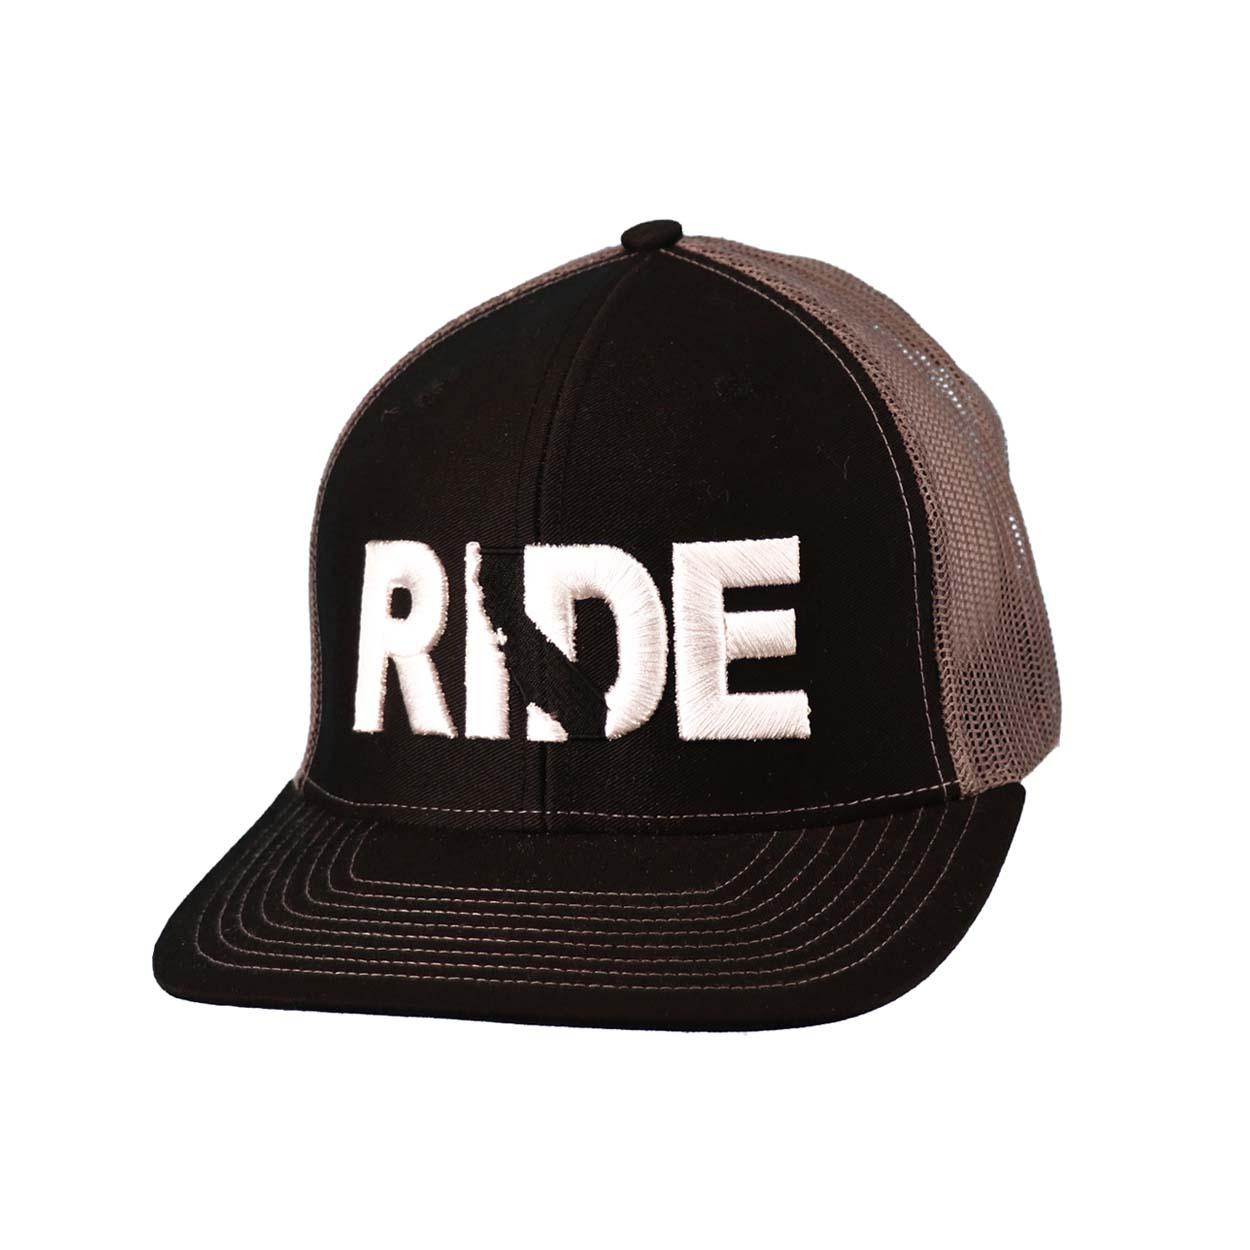 Ride California Classic Embroidered Snapback Trucker Hat Black/White